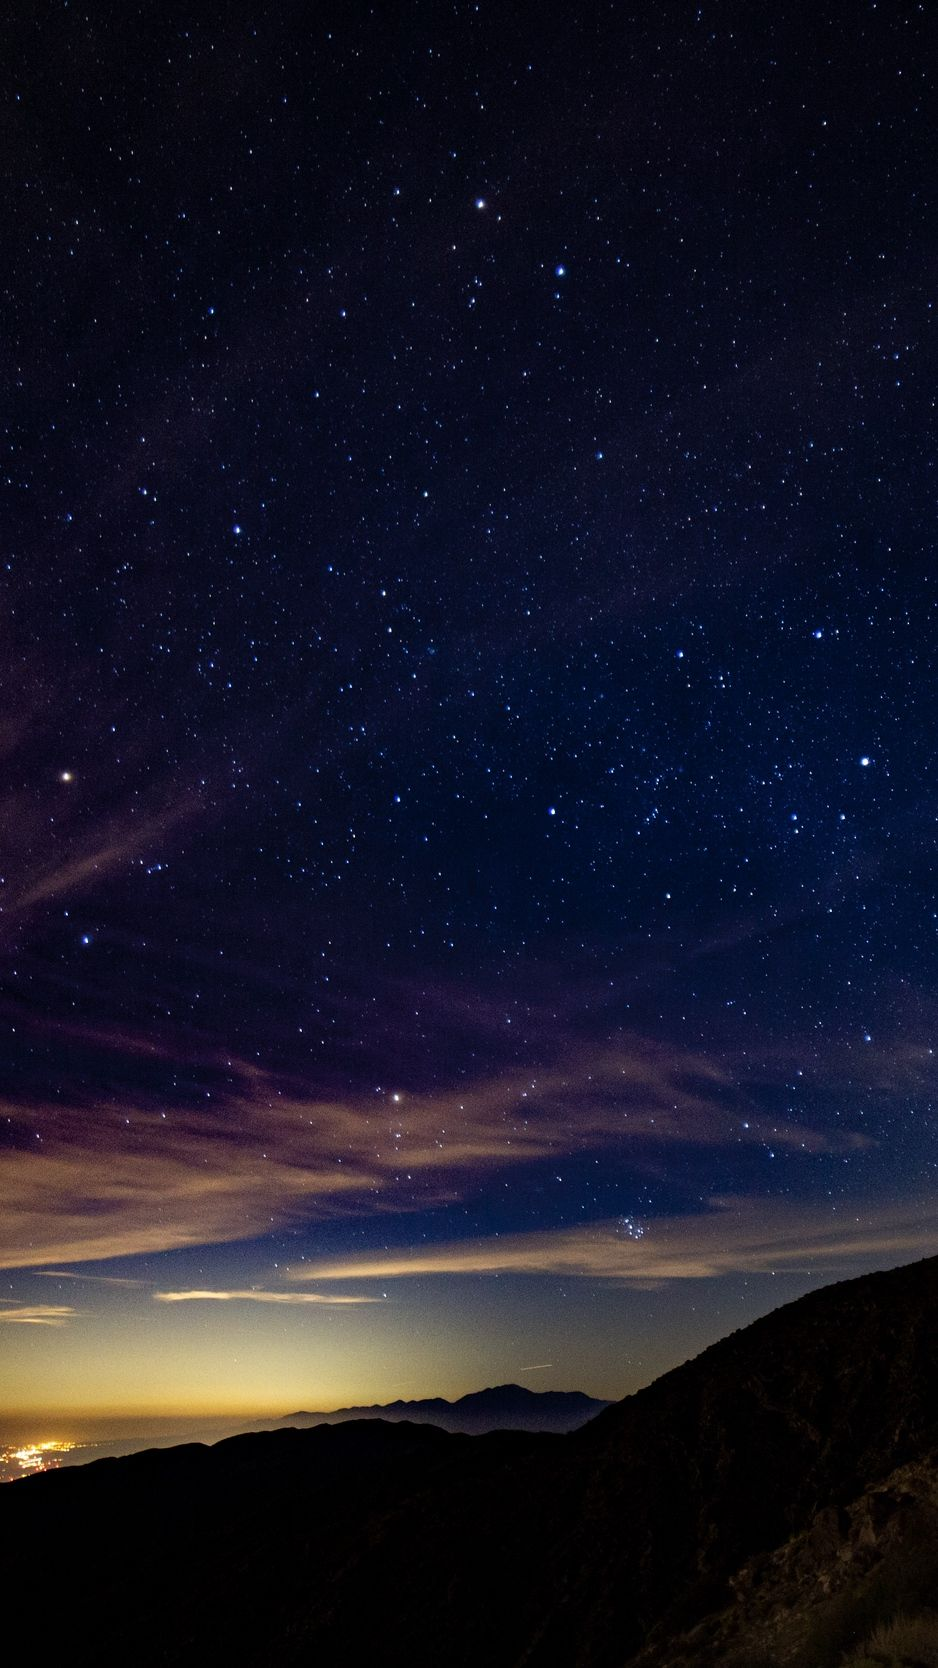 Starry Sky Mountains Stars Night Background Night Sky Photography Night Sky Wallpaper Sky Aesthetic